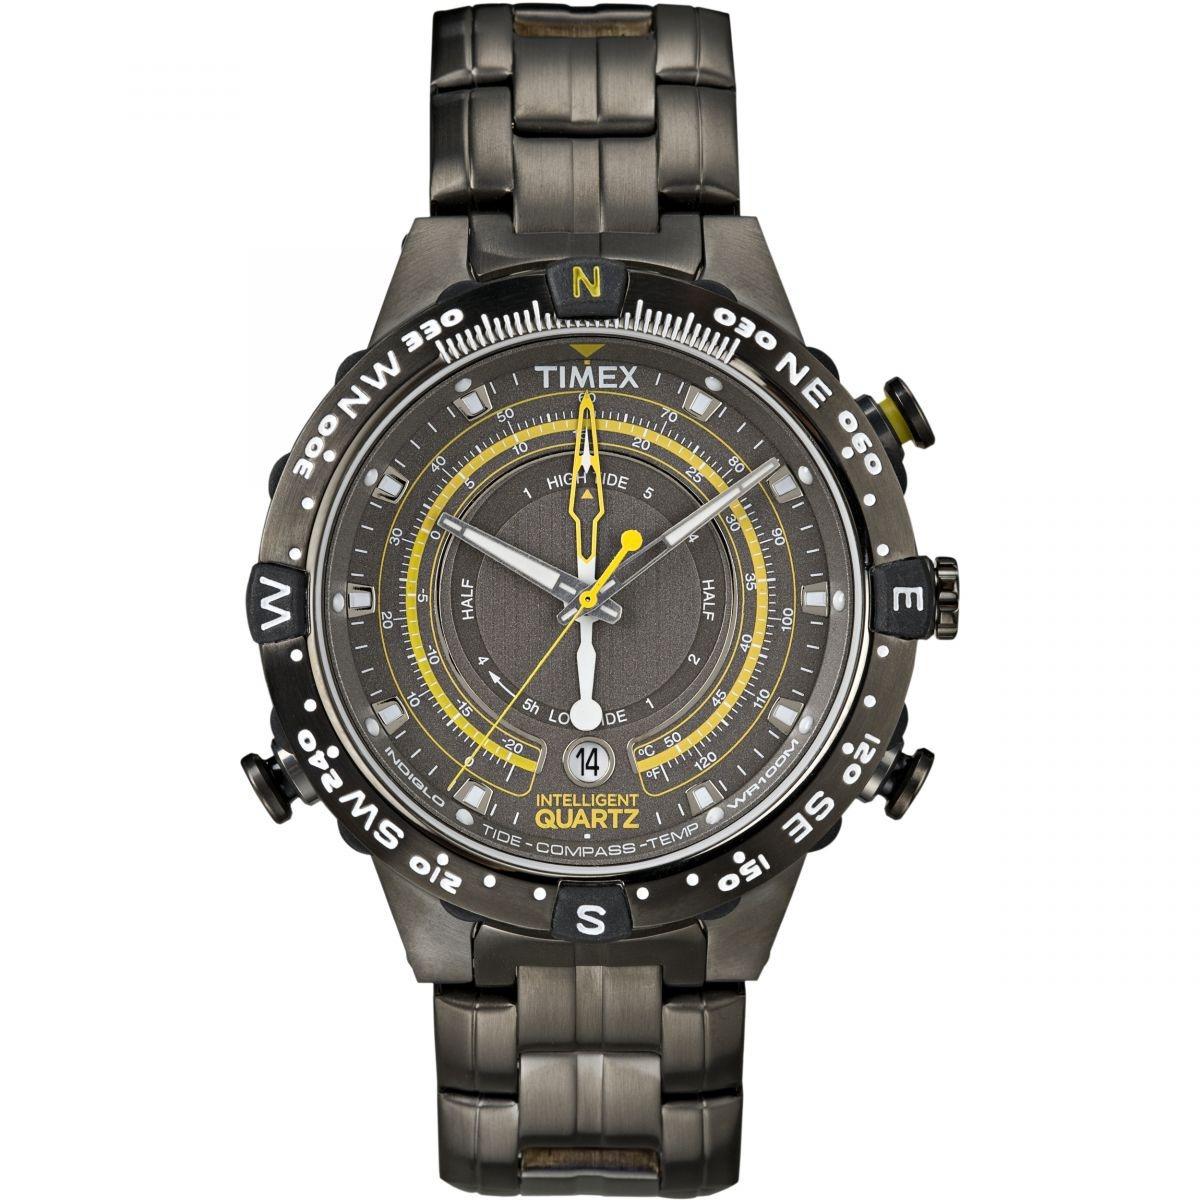 6f75a699108 relógio masculino timex intelligent quartz - t2p139. Carregando zoom.